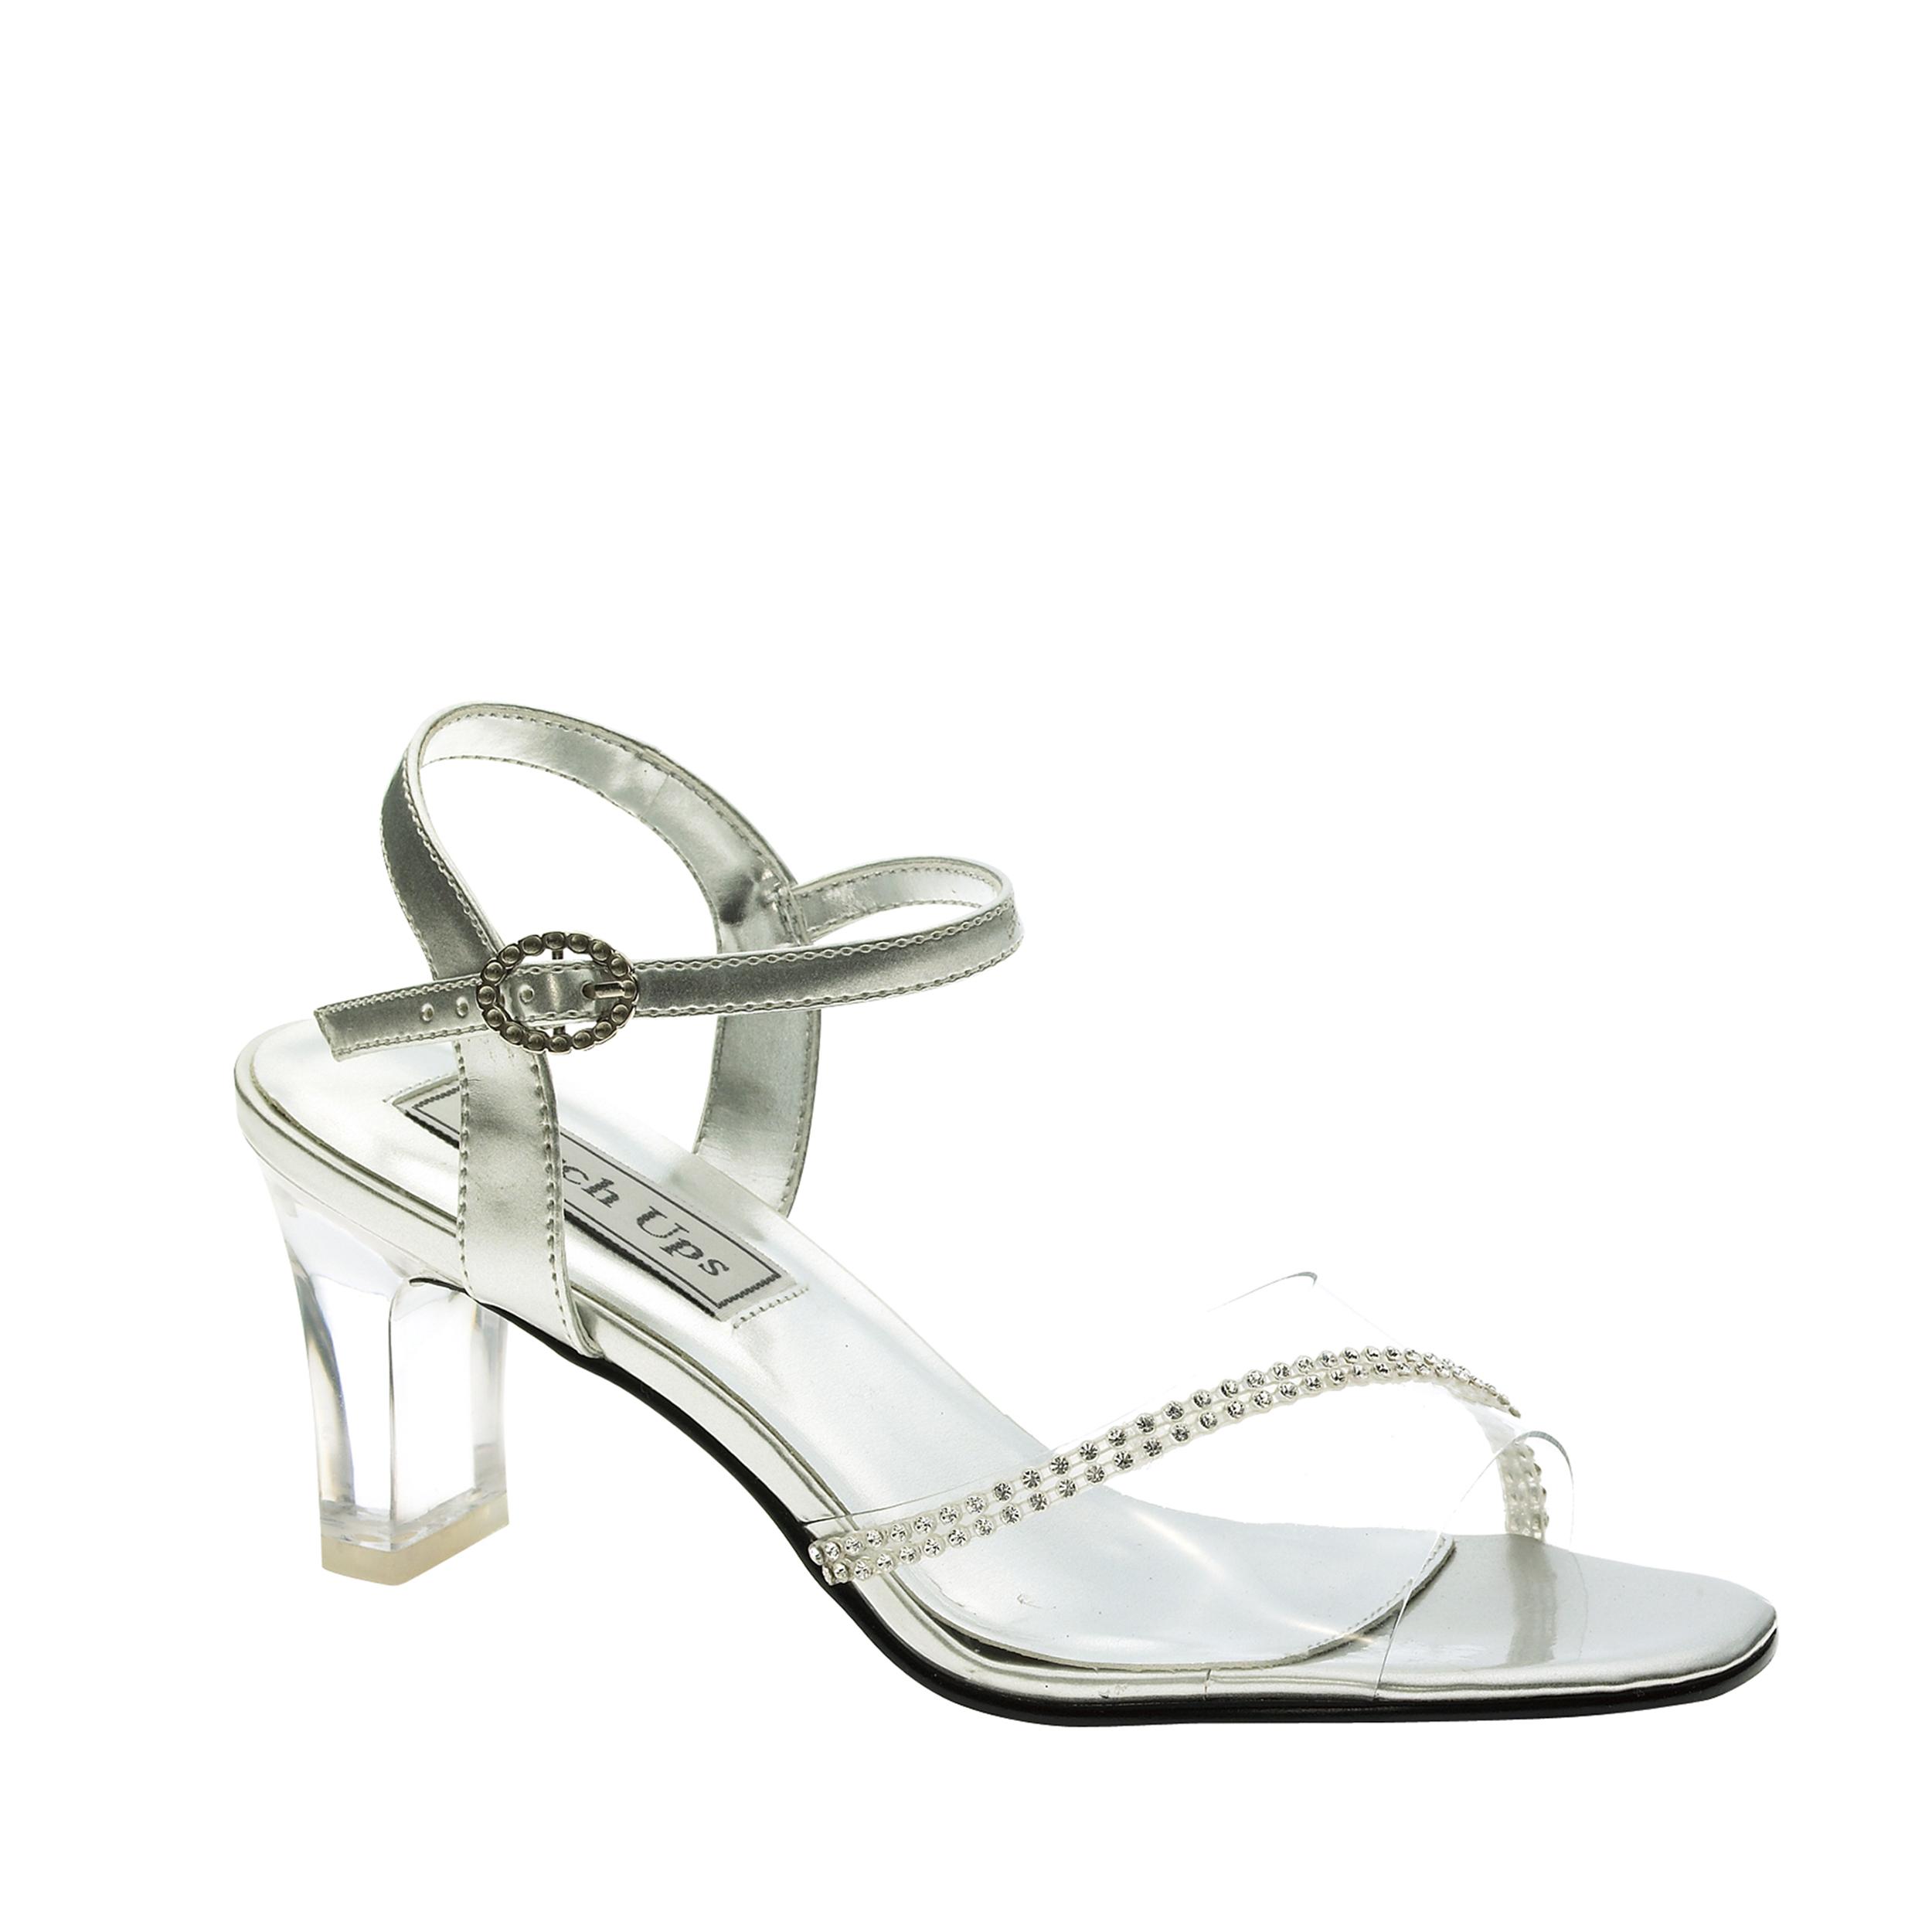 Touch Ups Carmella Womens Clear/Silver Sandals 8 W